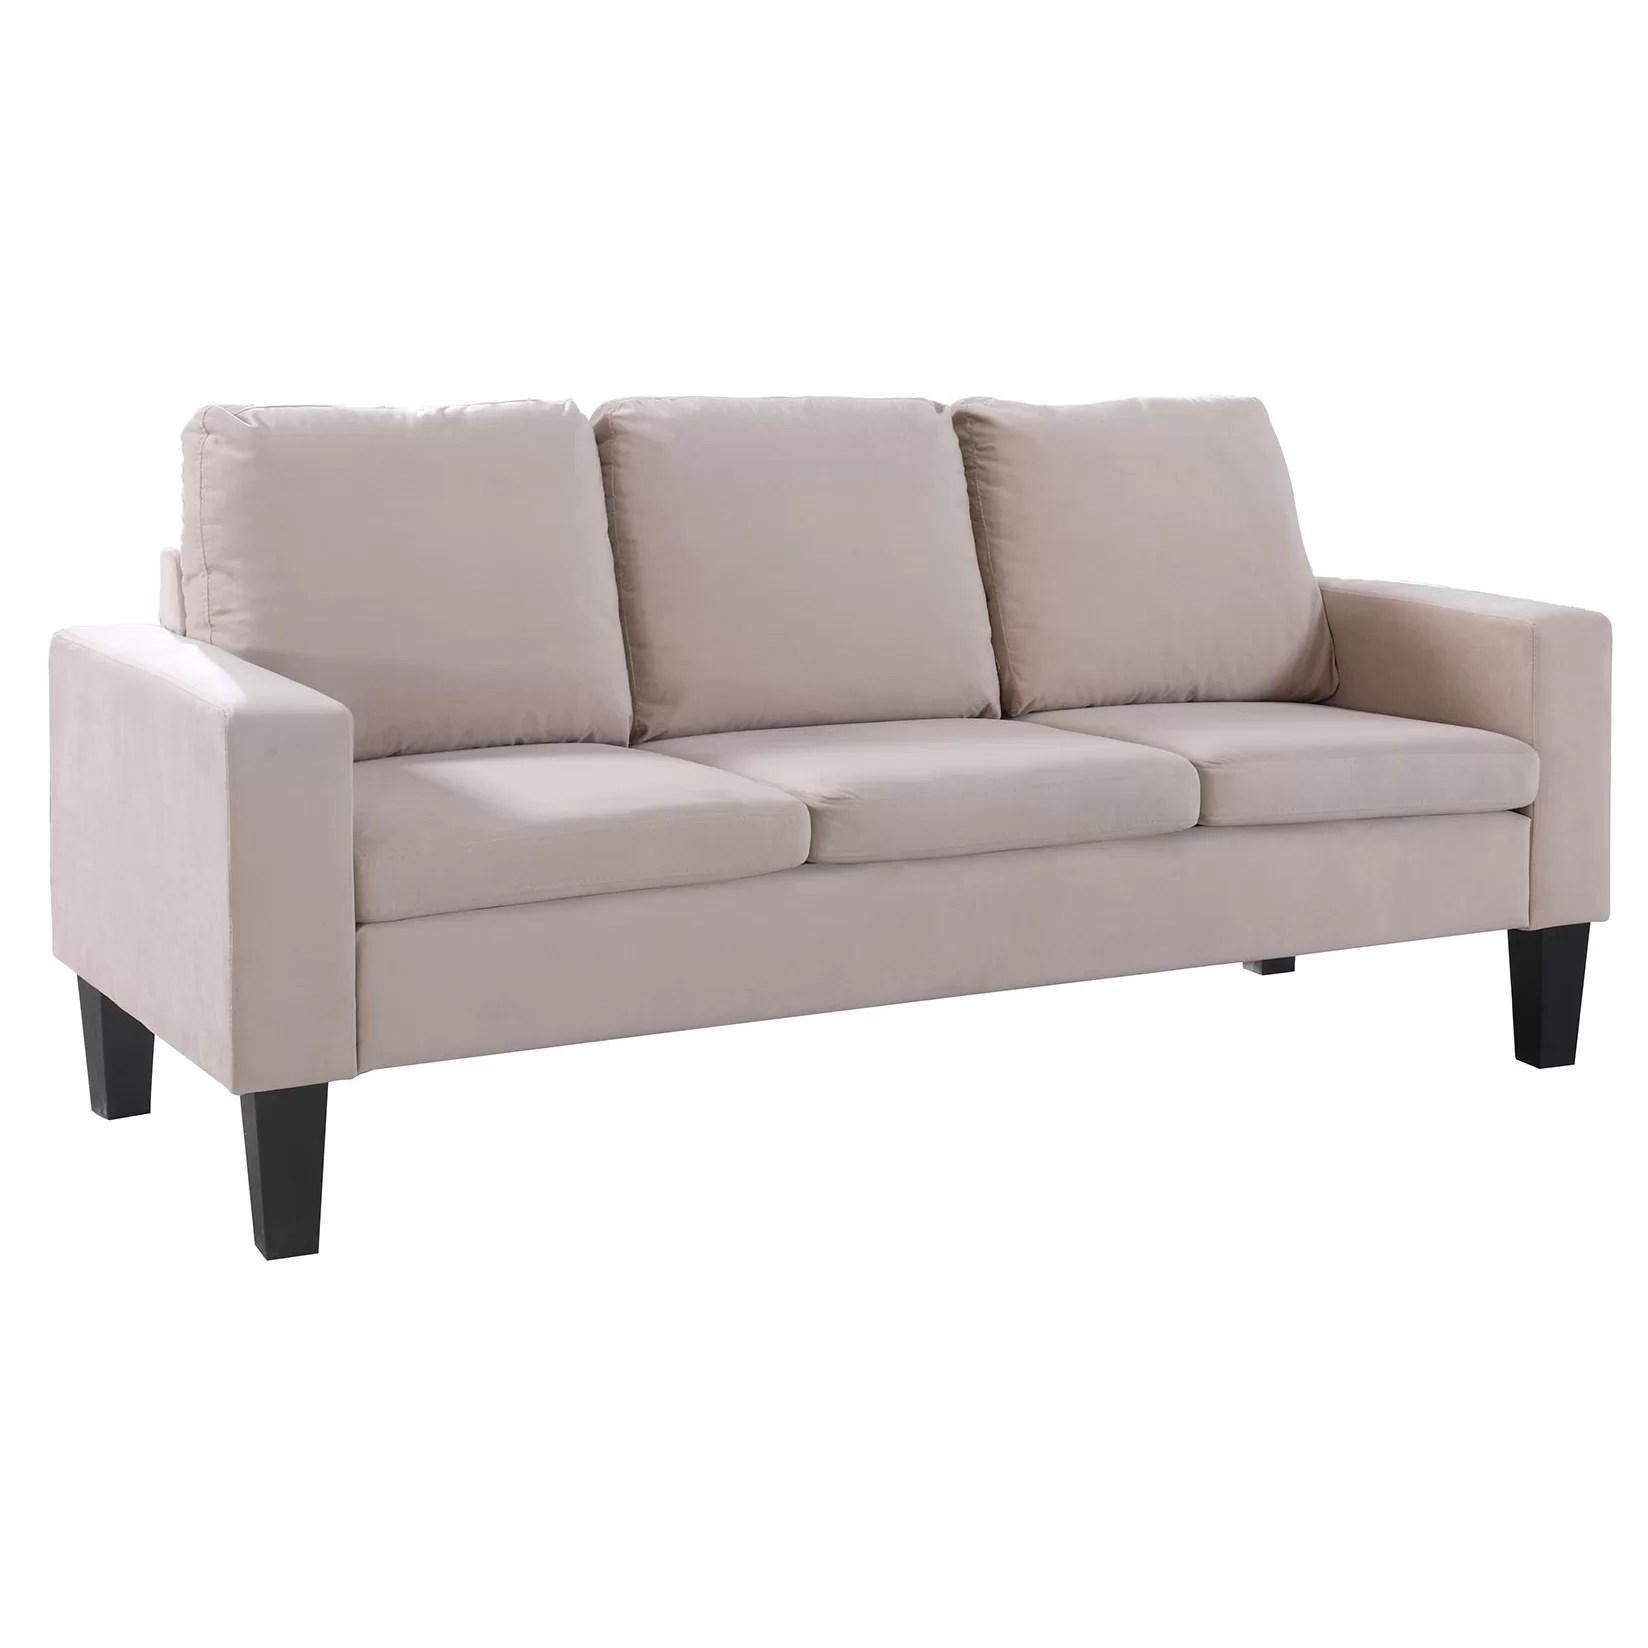 wayfair sofa reviews leather sofas san antonio tx nathanielhome sarah and